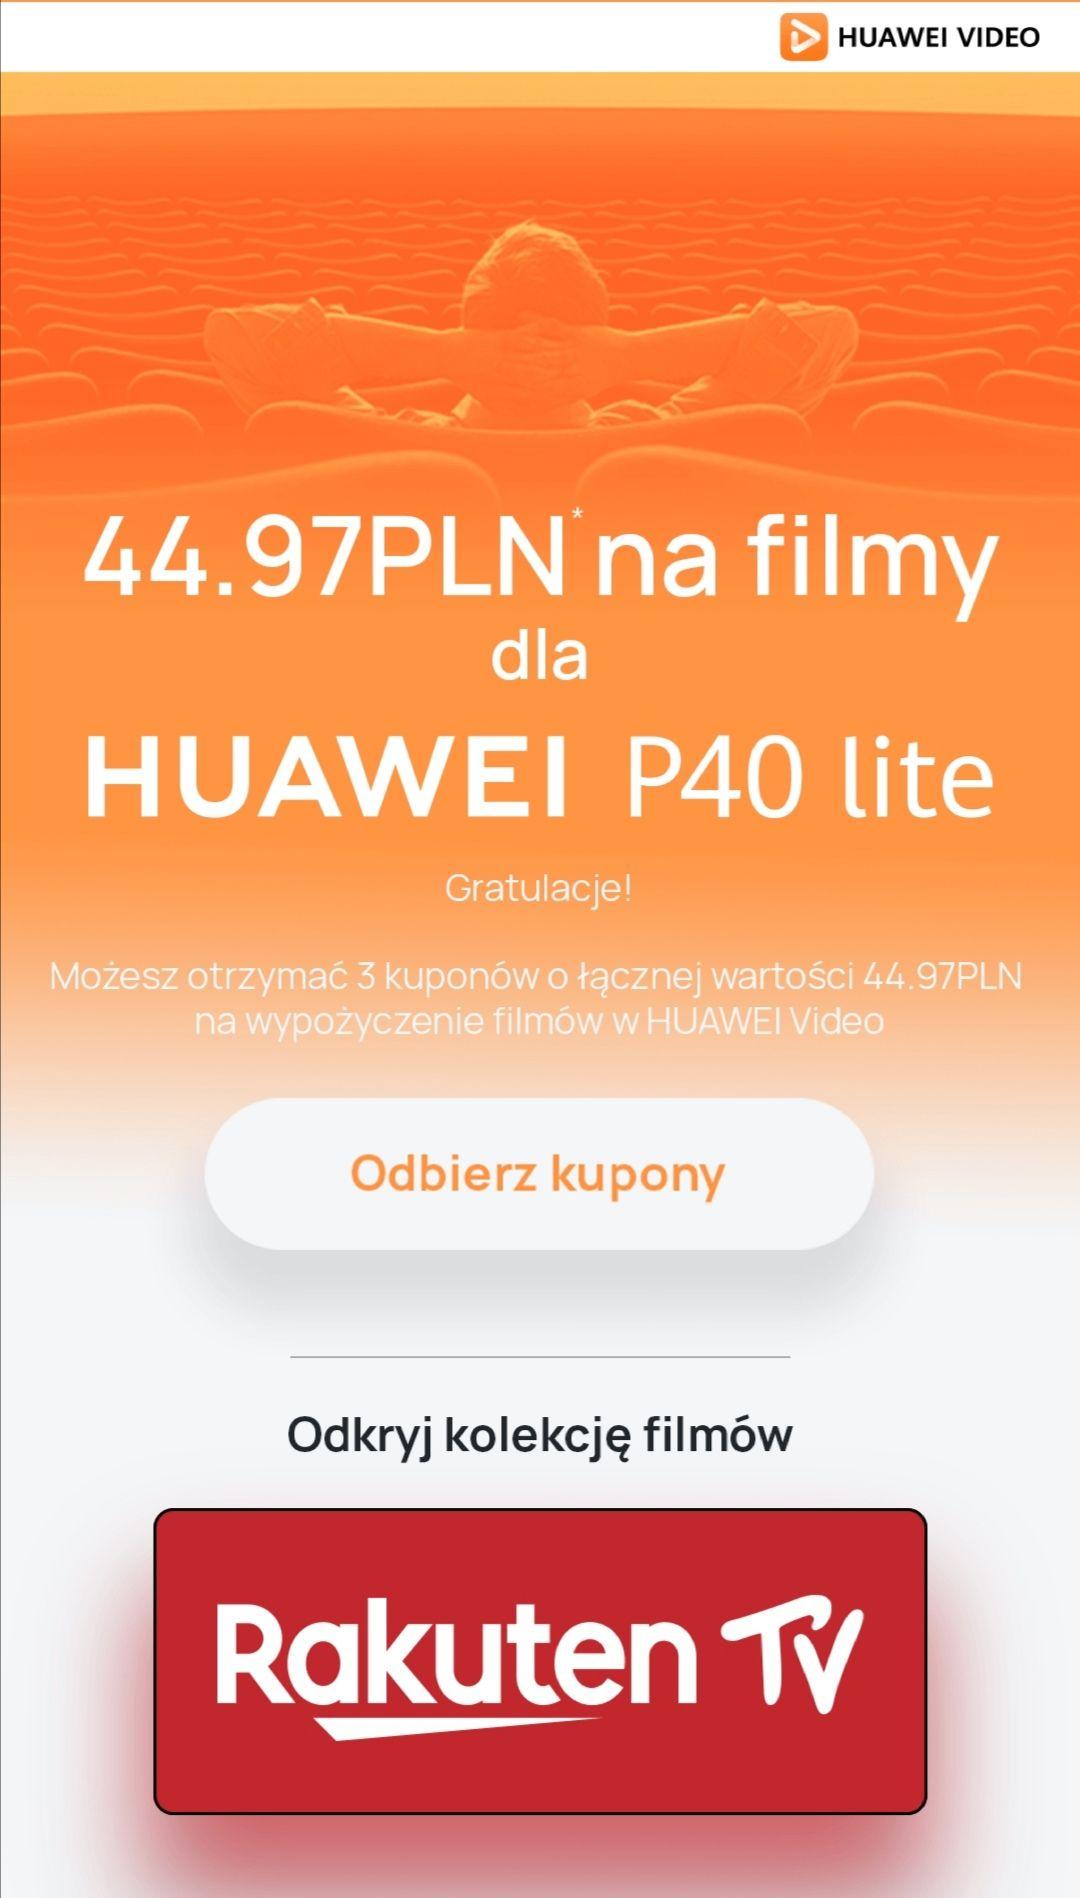 Huawei P40 - Kupony na 3 filmy z kolekcji Rakuten TV